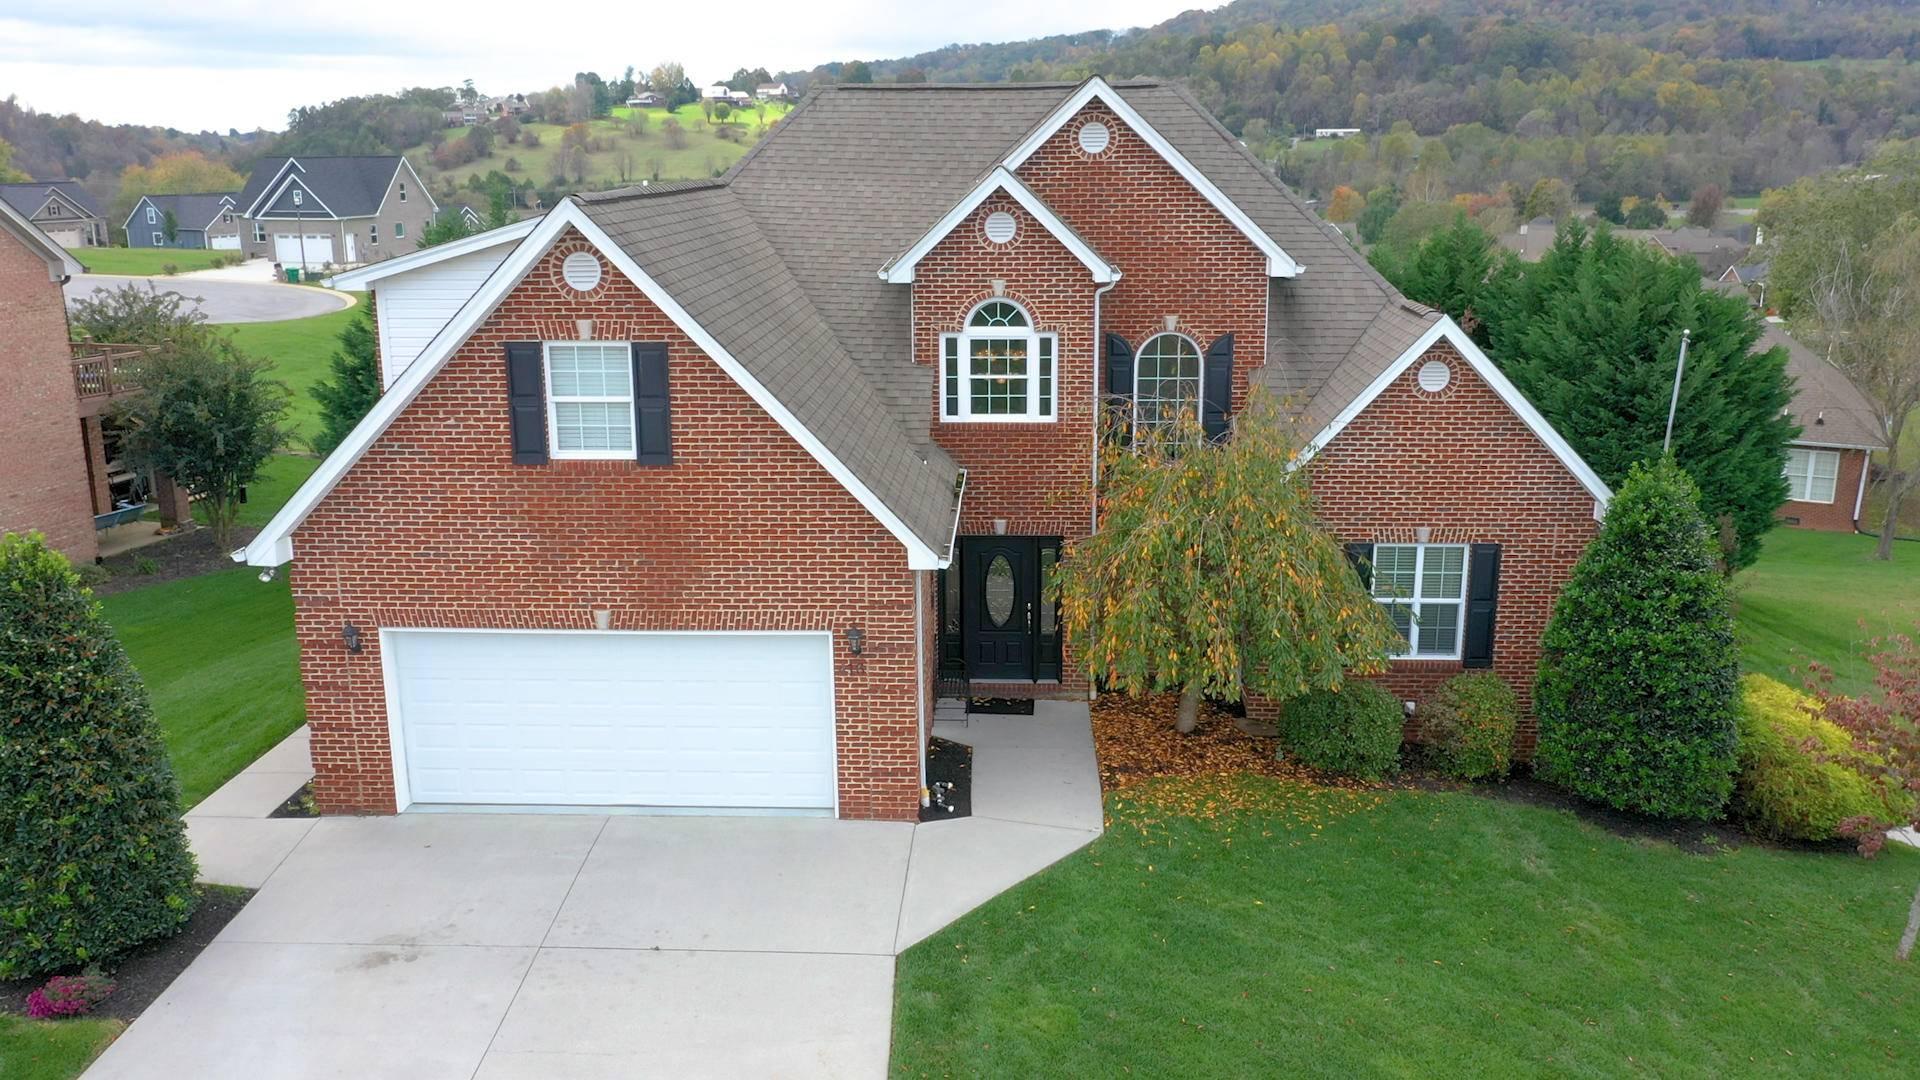 Property for Sale - 416 Kensington DR, Morristown, TN 37814 – MLS#1...